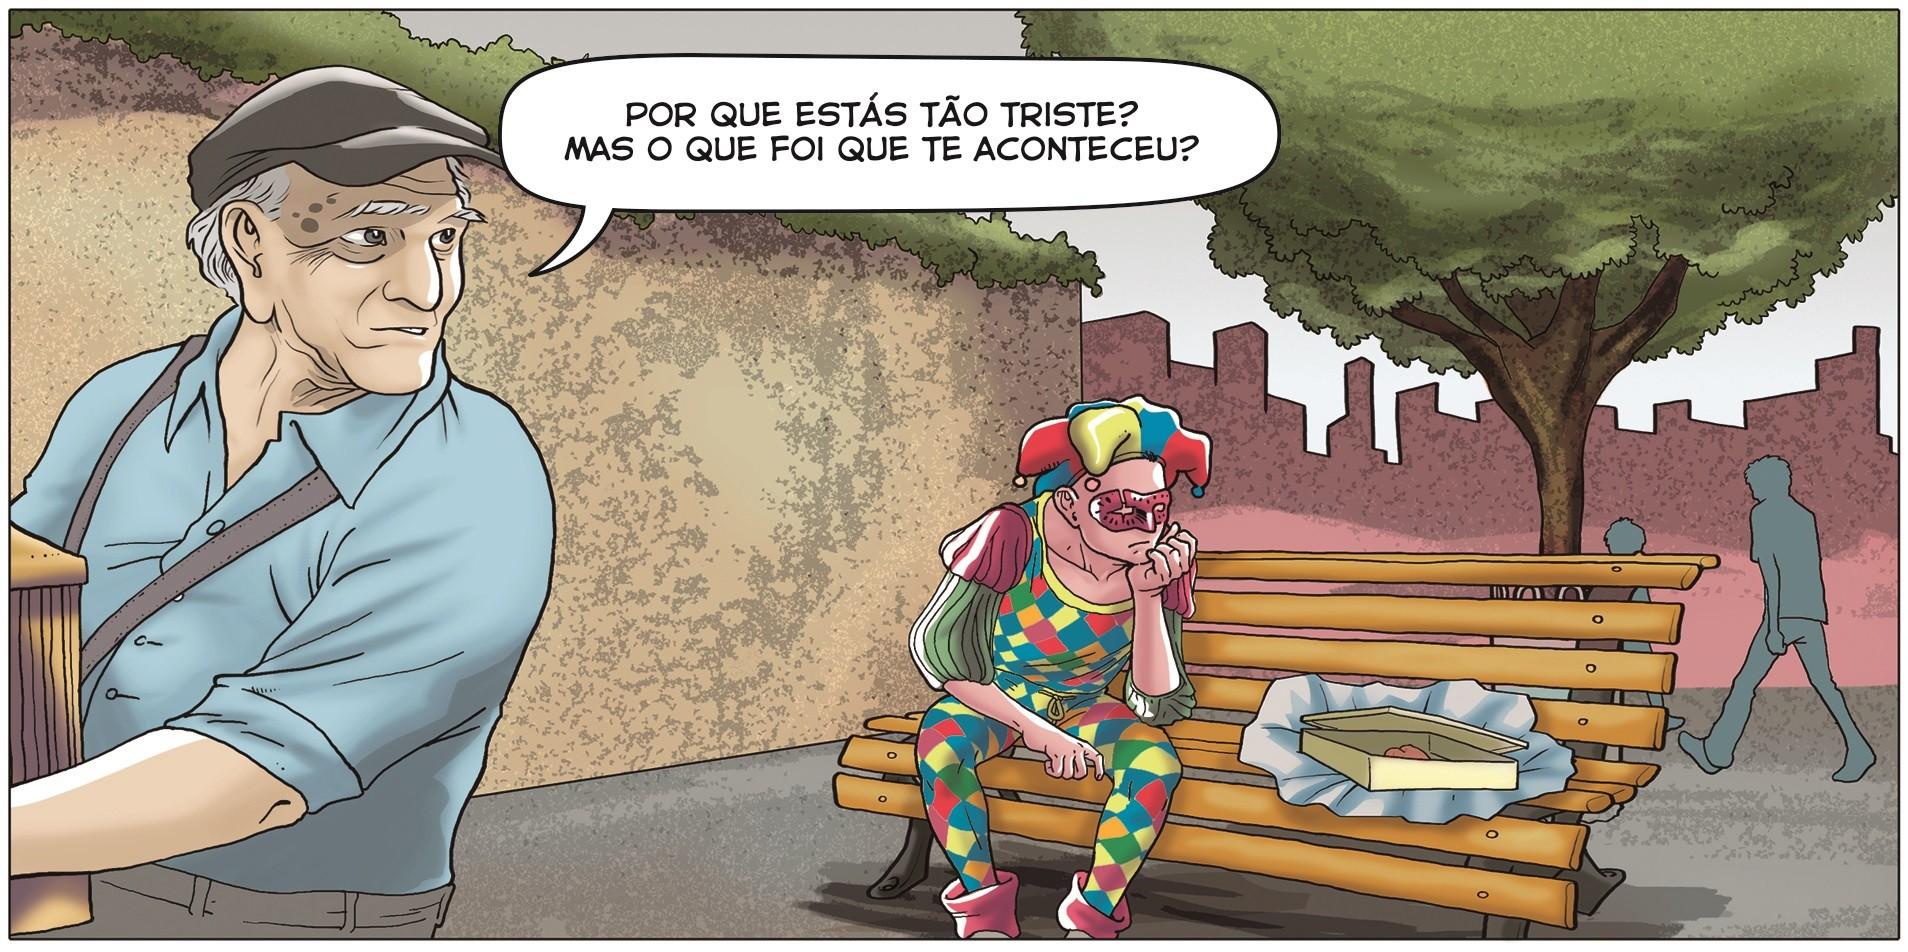 (Foto: Marcelo Saravá e Marjory Abuleac (roteiro), André Leal (arte), Omar Viñole (cores) )